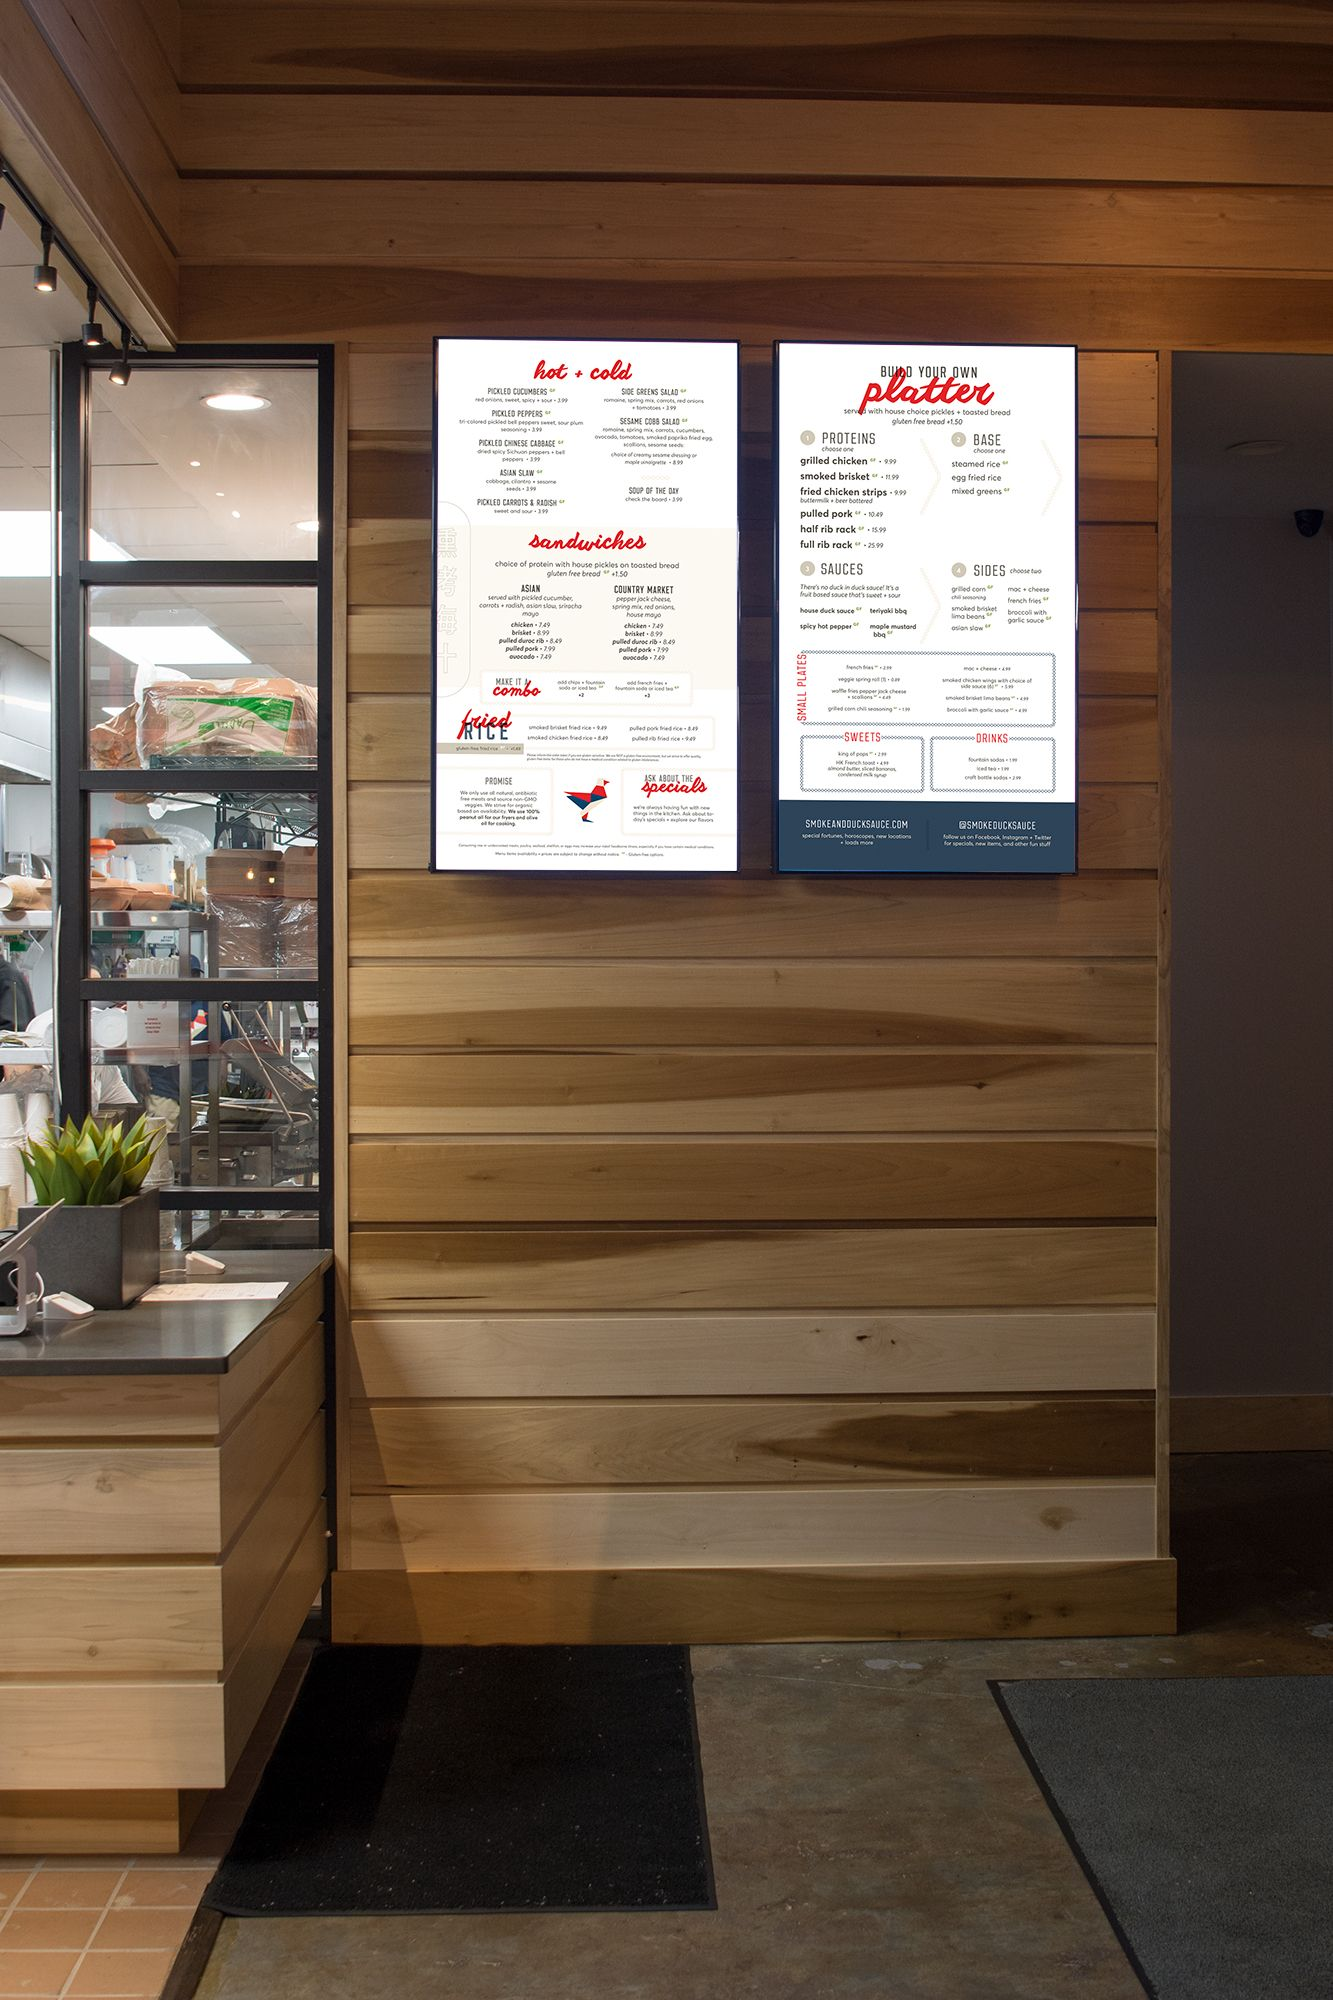 Digital menu board design and interiors for Smoke & Duck Sauce in